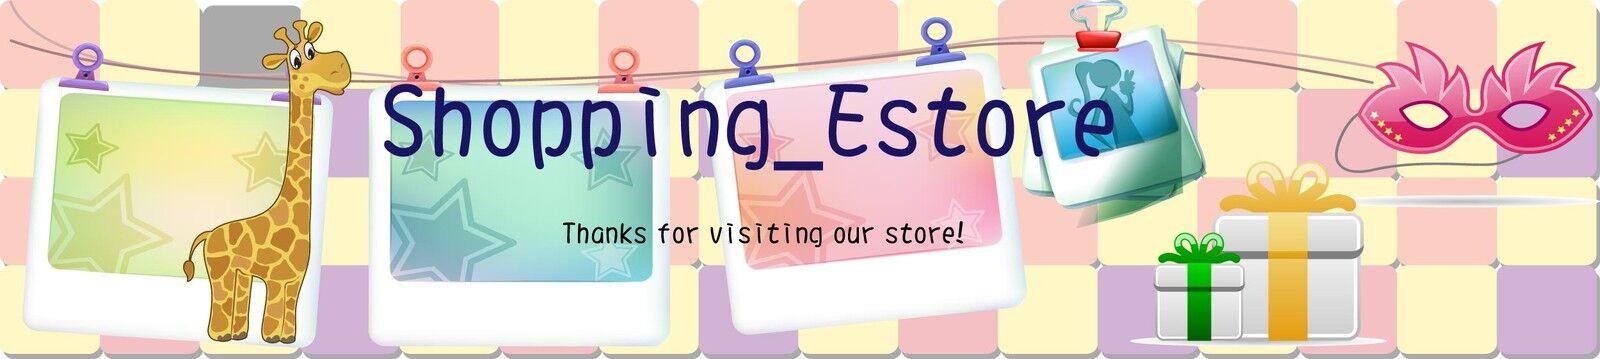 Shopping_Estore